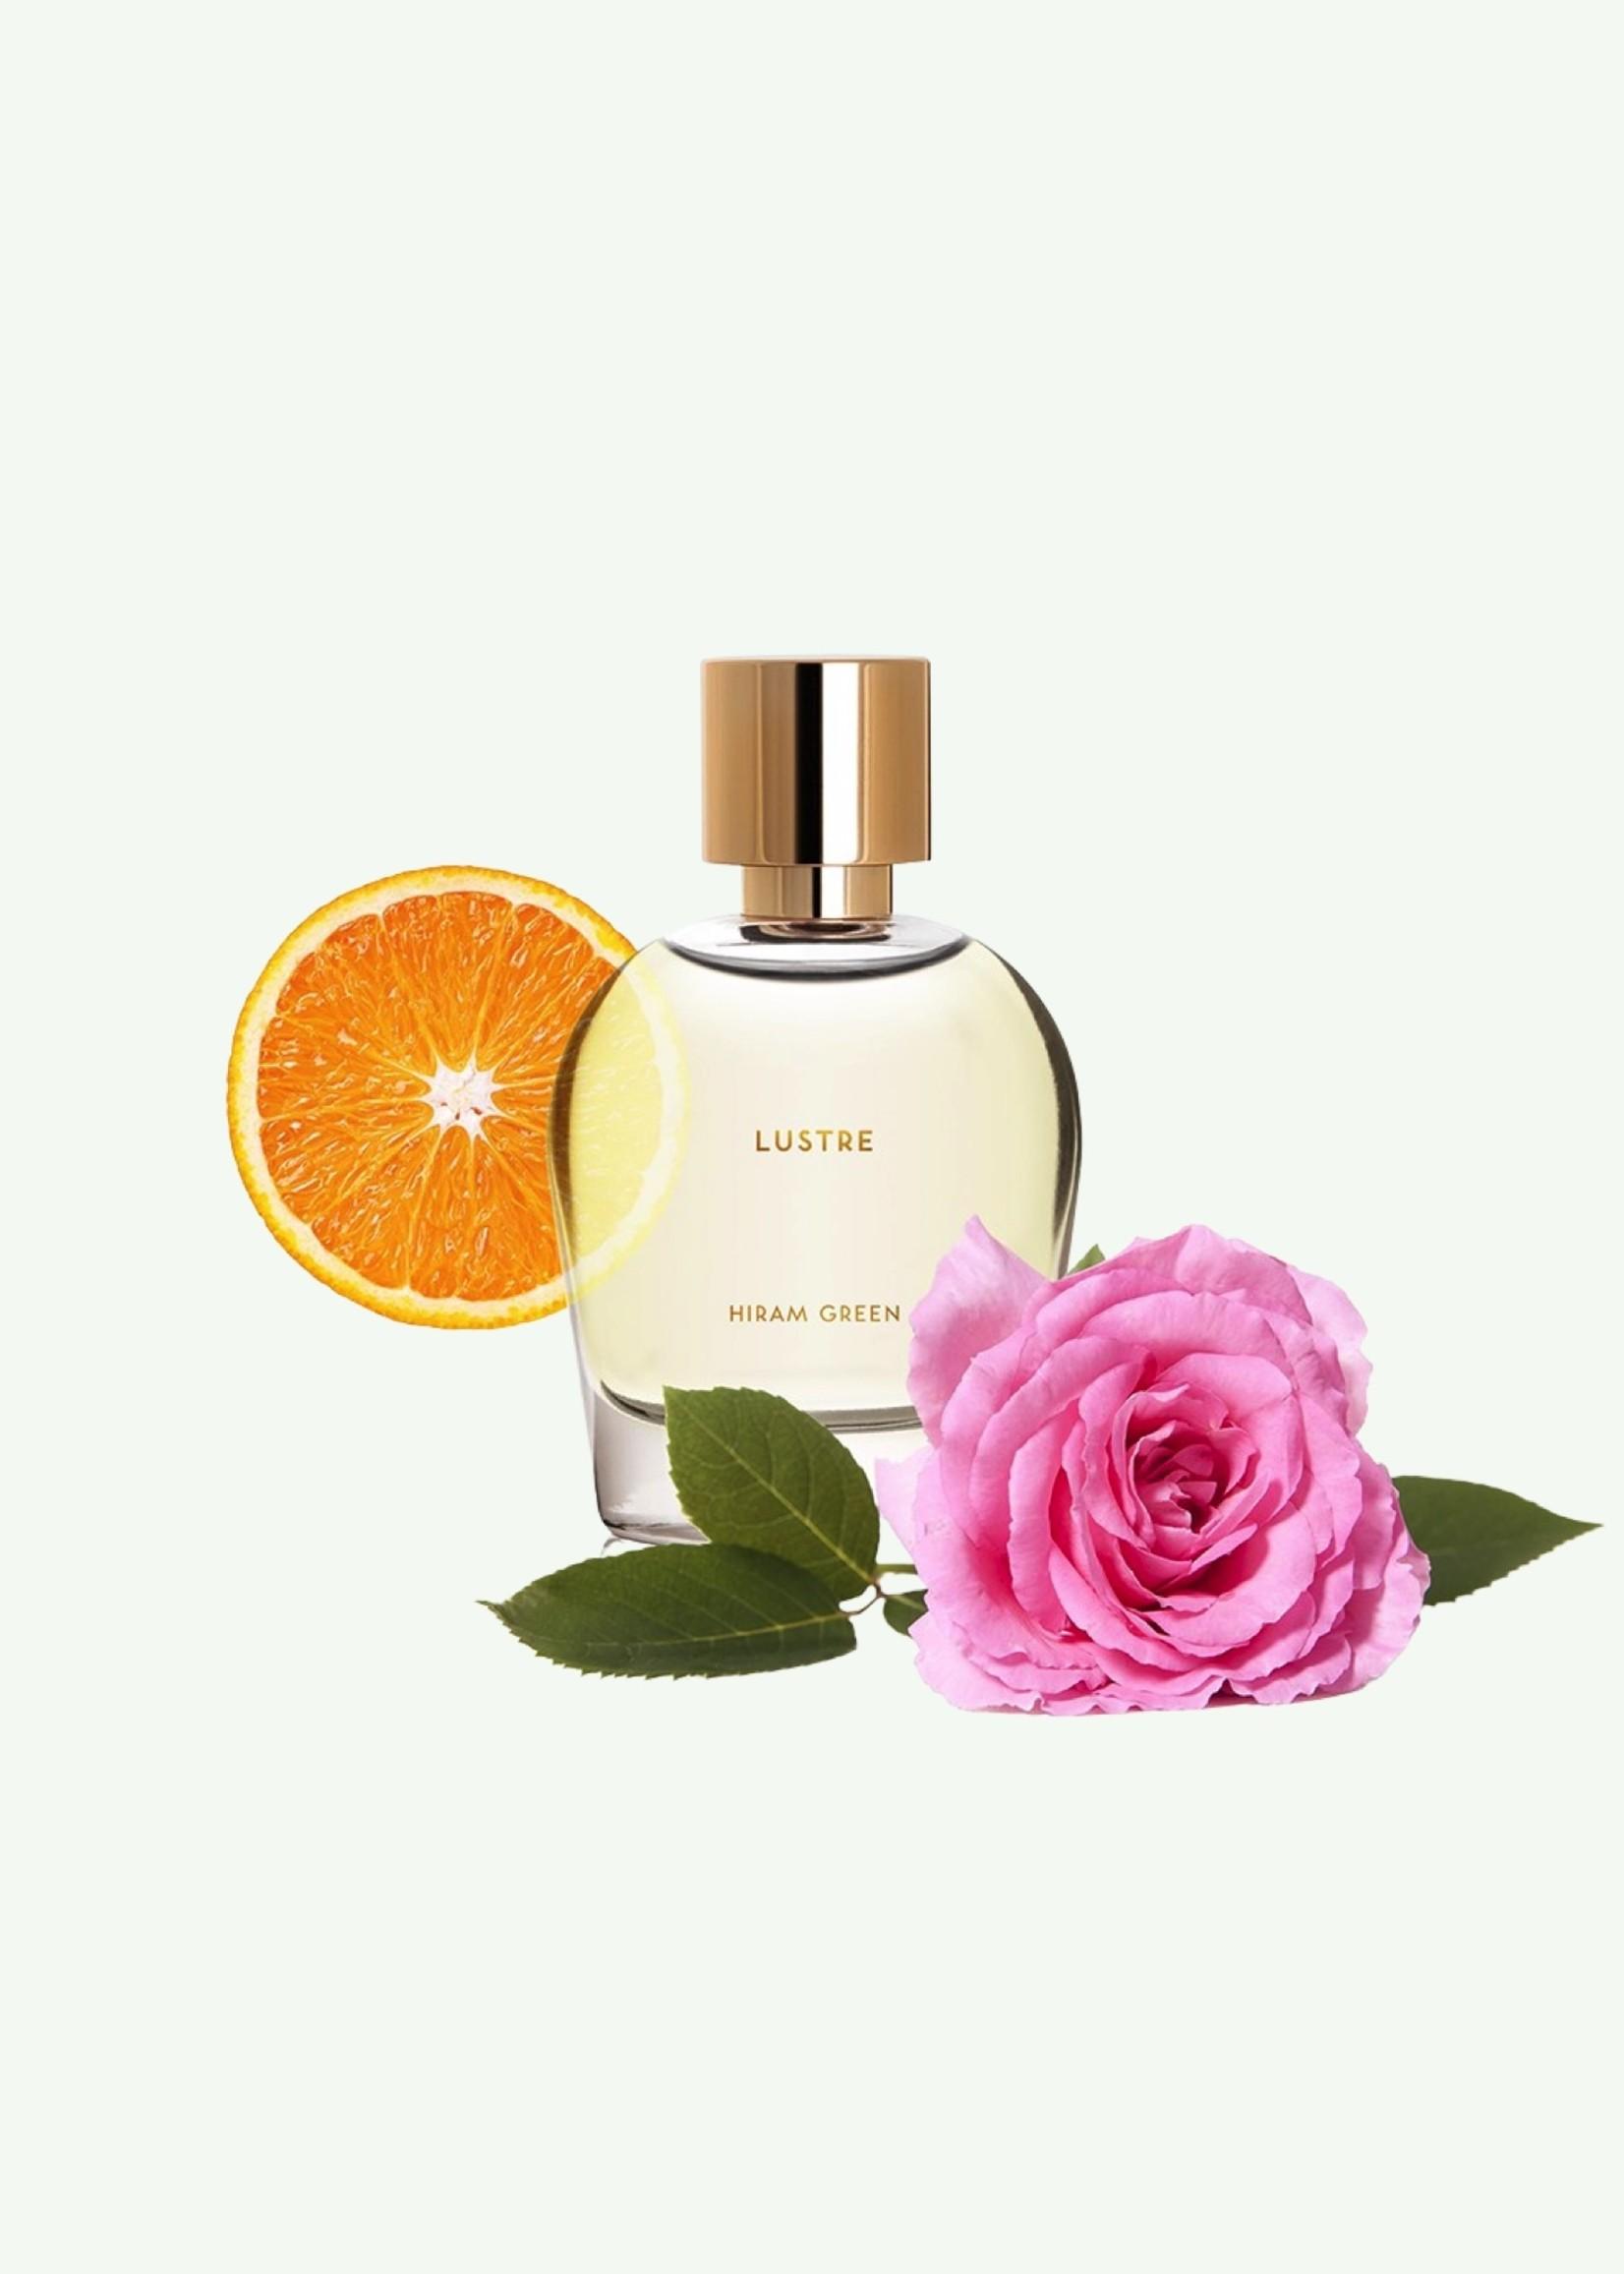 Hiram Green Hiram Green - Lustre - Eau de Parfum